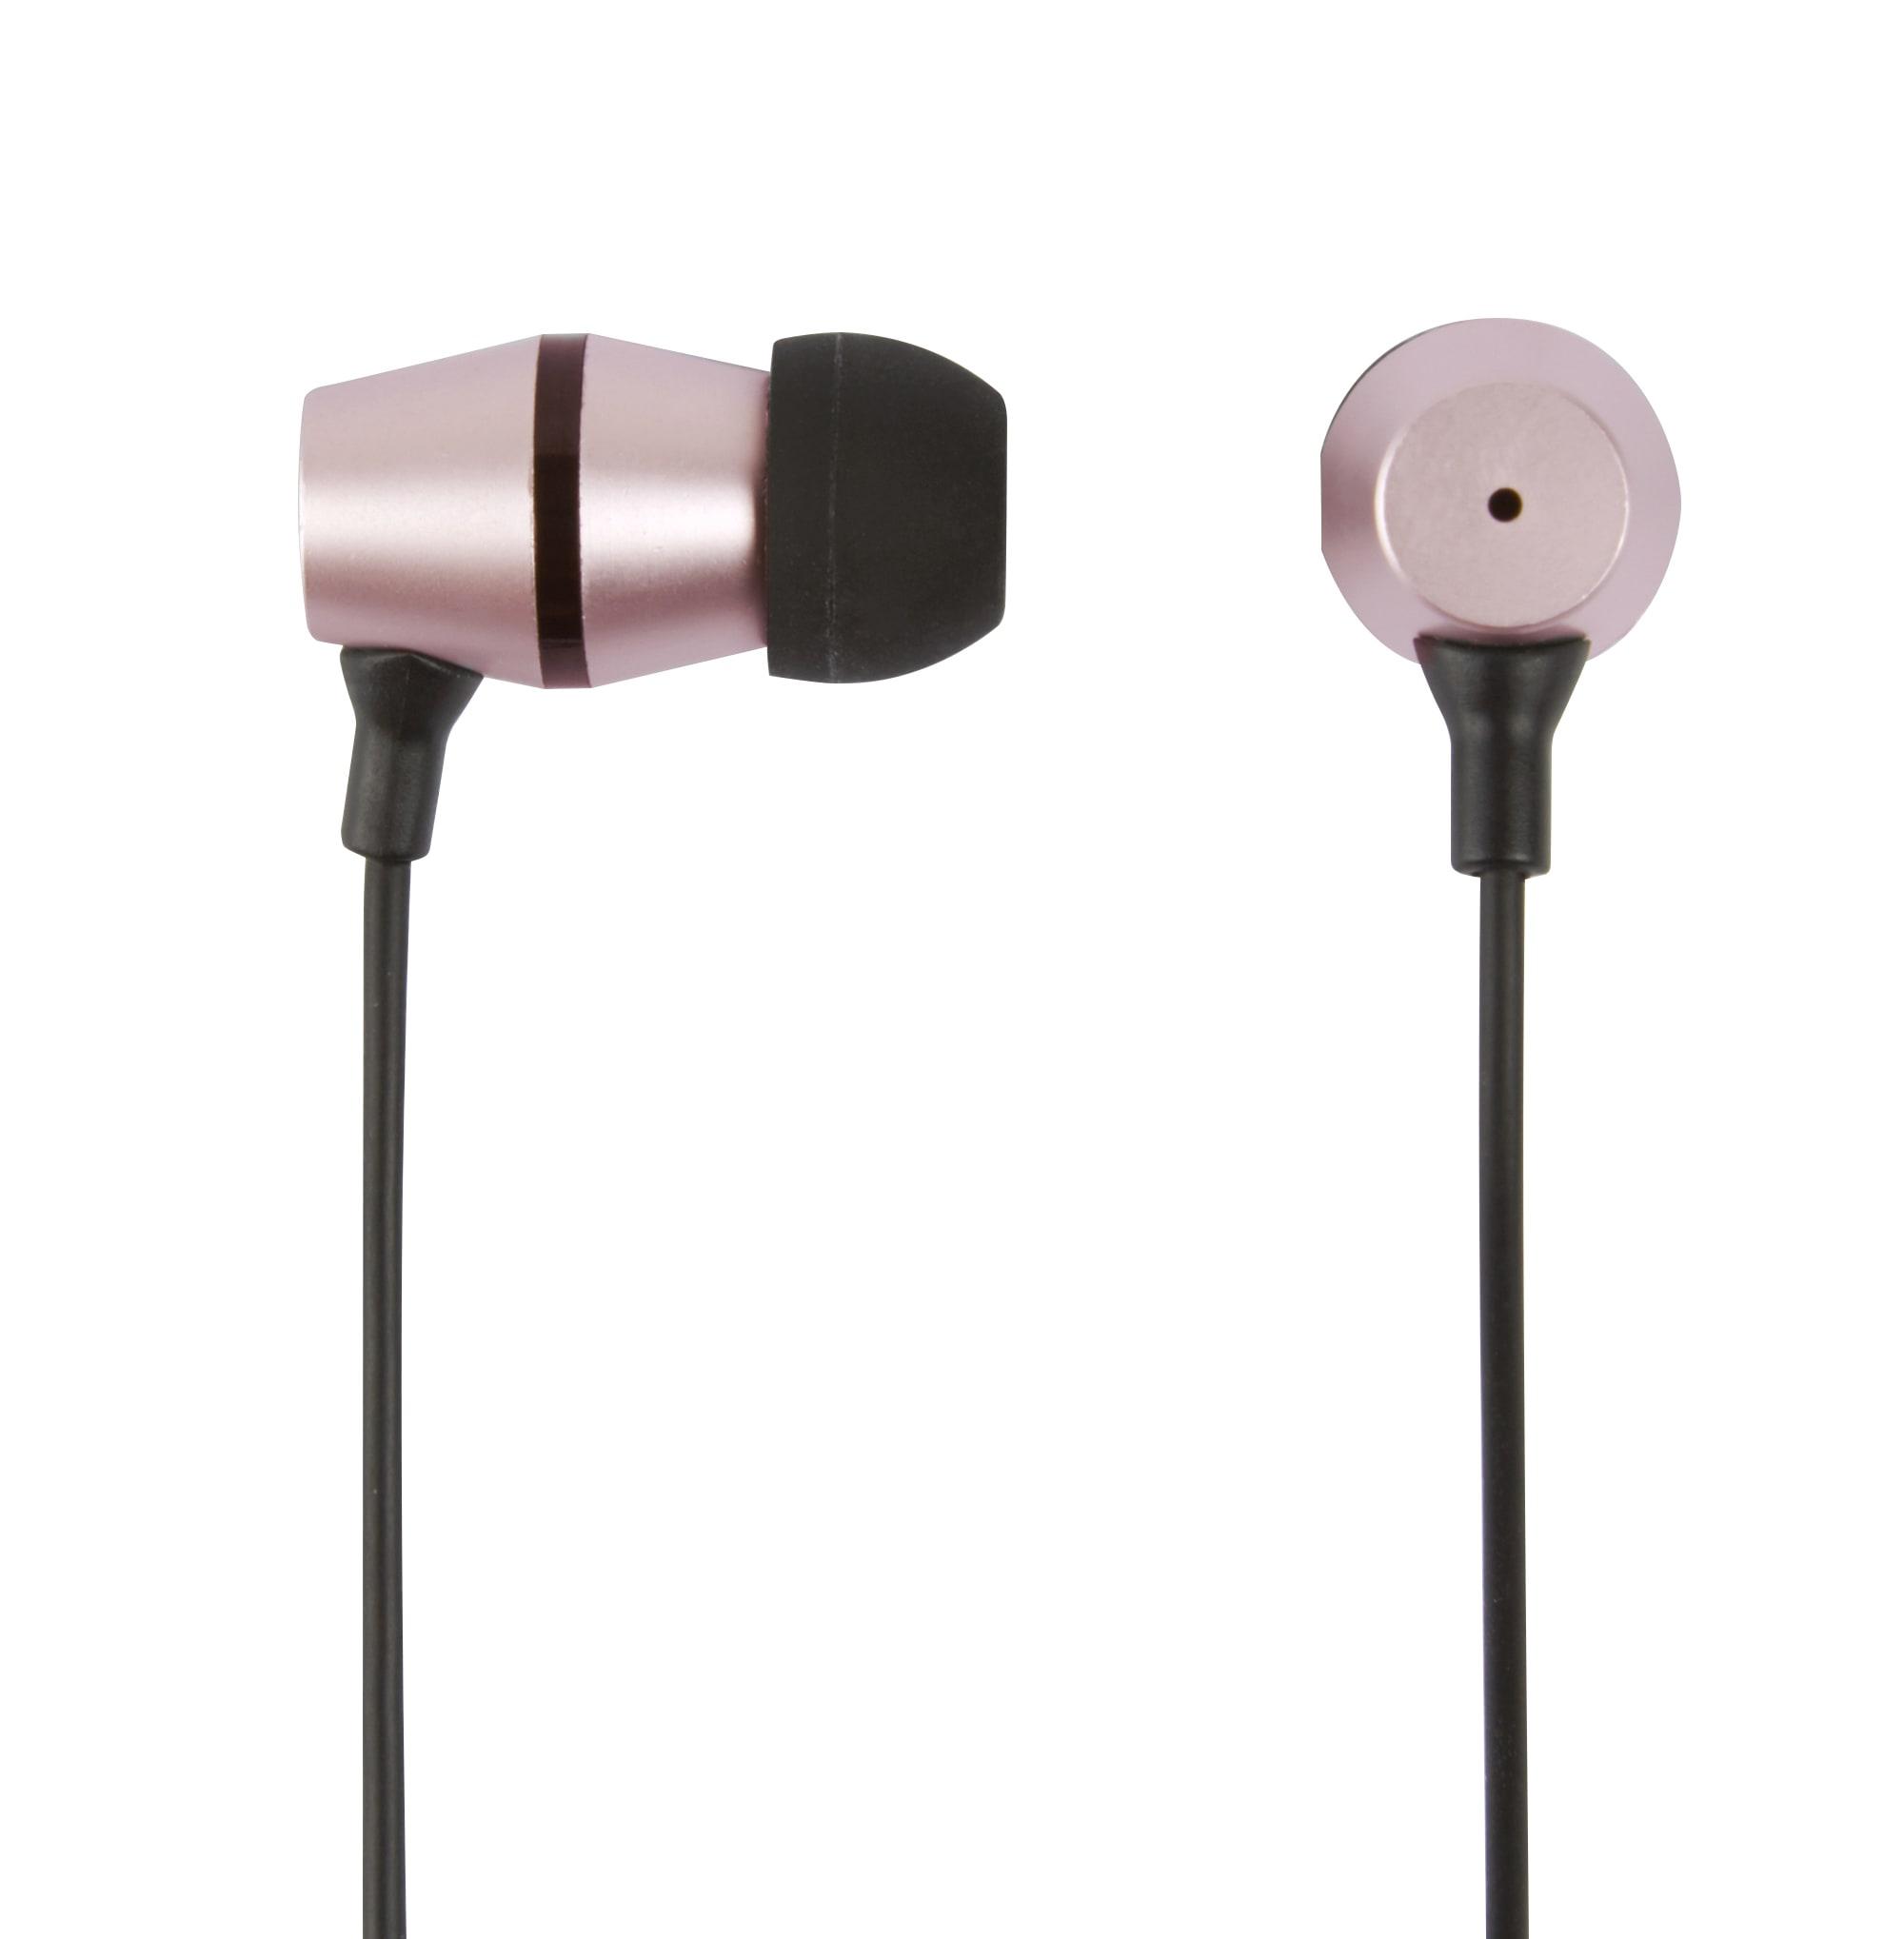 Ativa™ Metal Earbud Headphones, Rose Gold, WD-OD05-RG